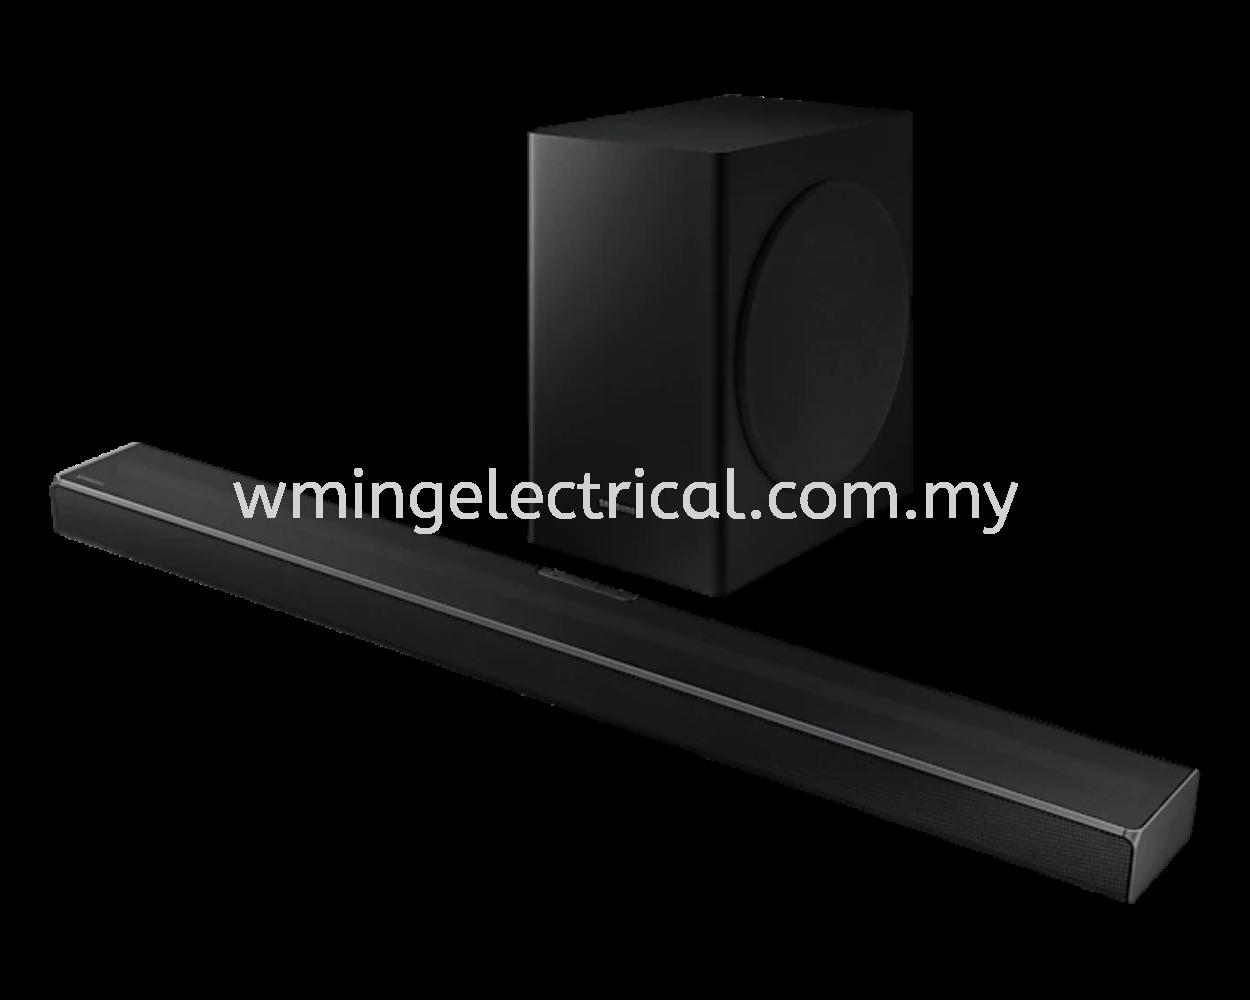 (New 2020 Model) Samsung Q60T Soundbar with Acoustic Beam Technology HW-Q60T HW-Q60T/XM